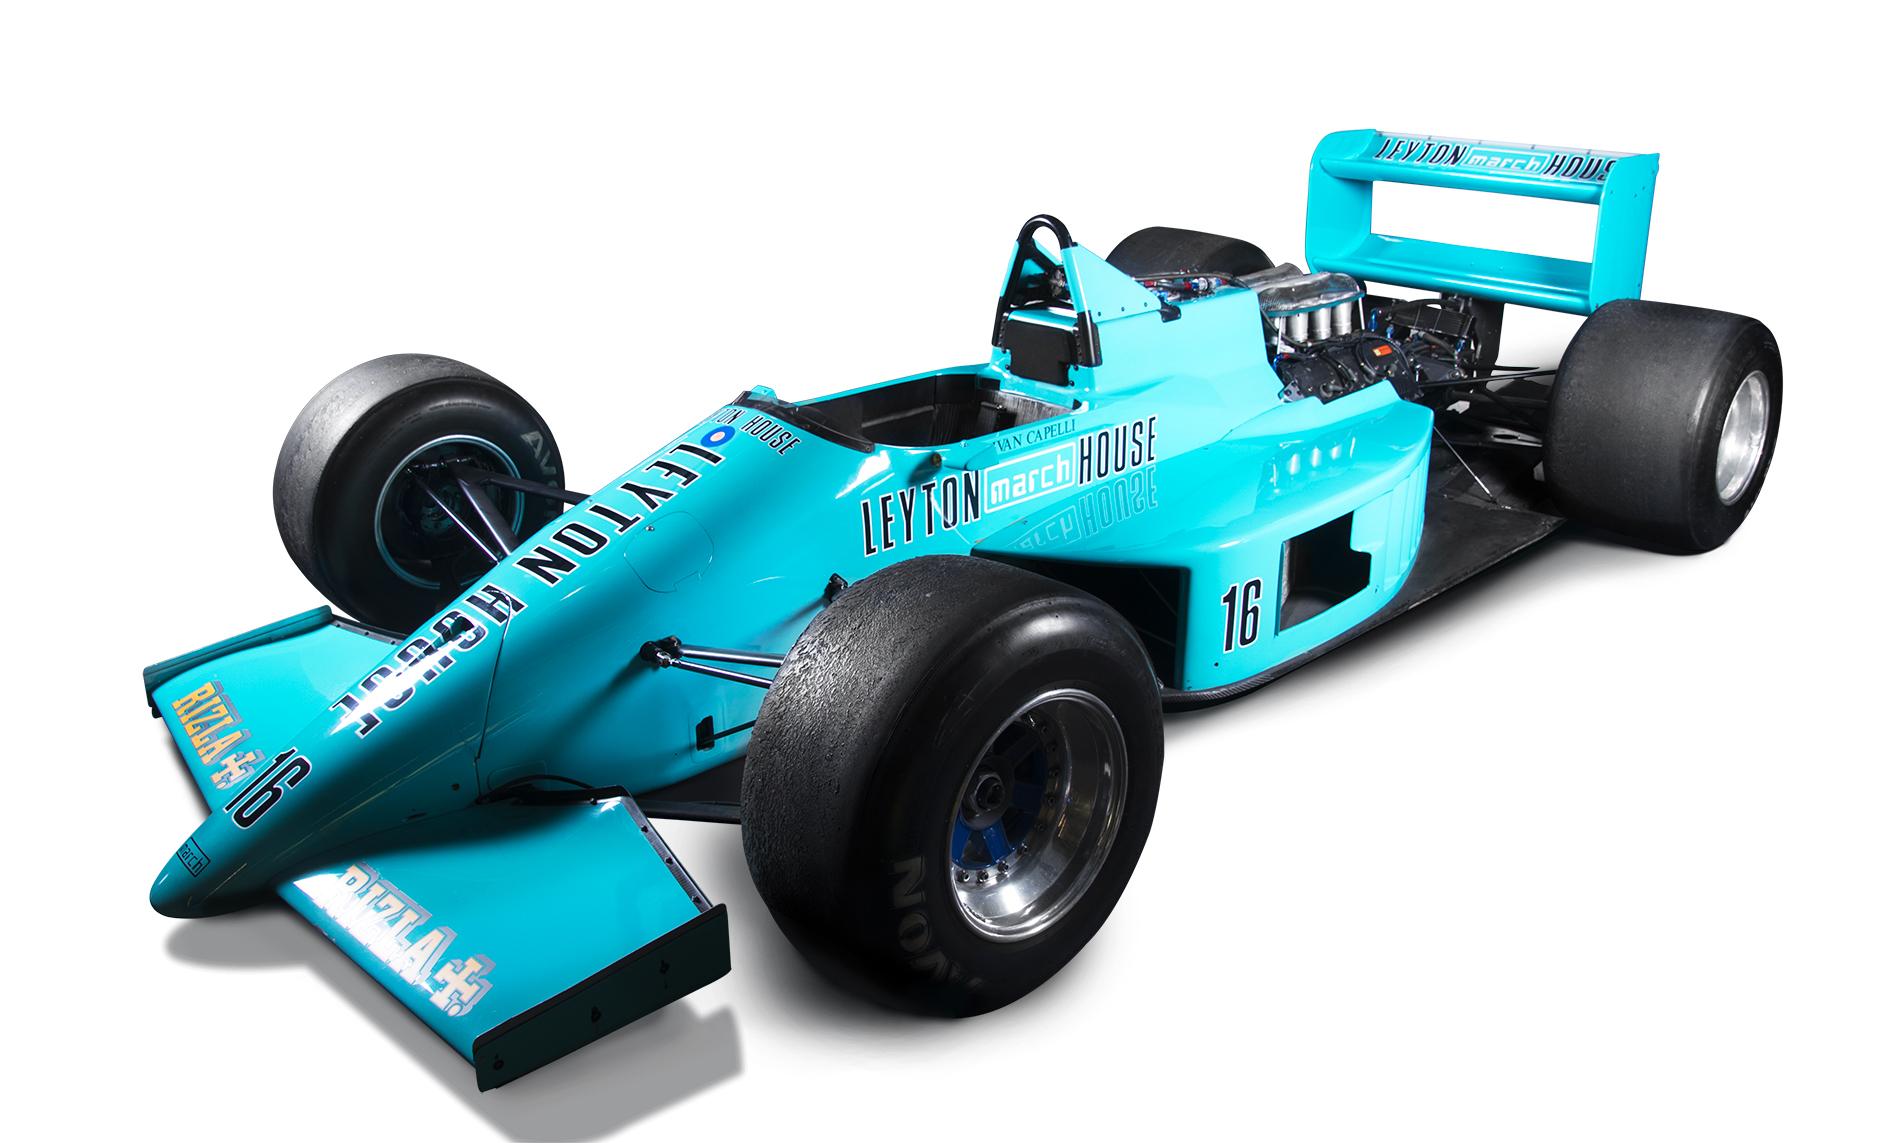 1987 – MARCHLeyton House F1